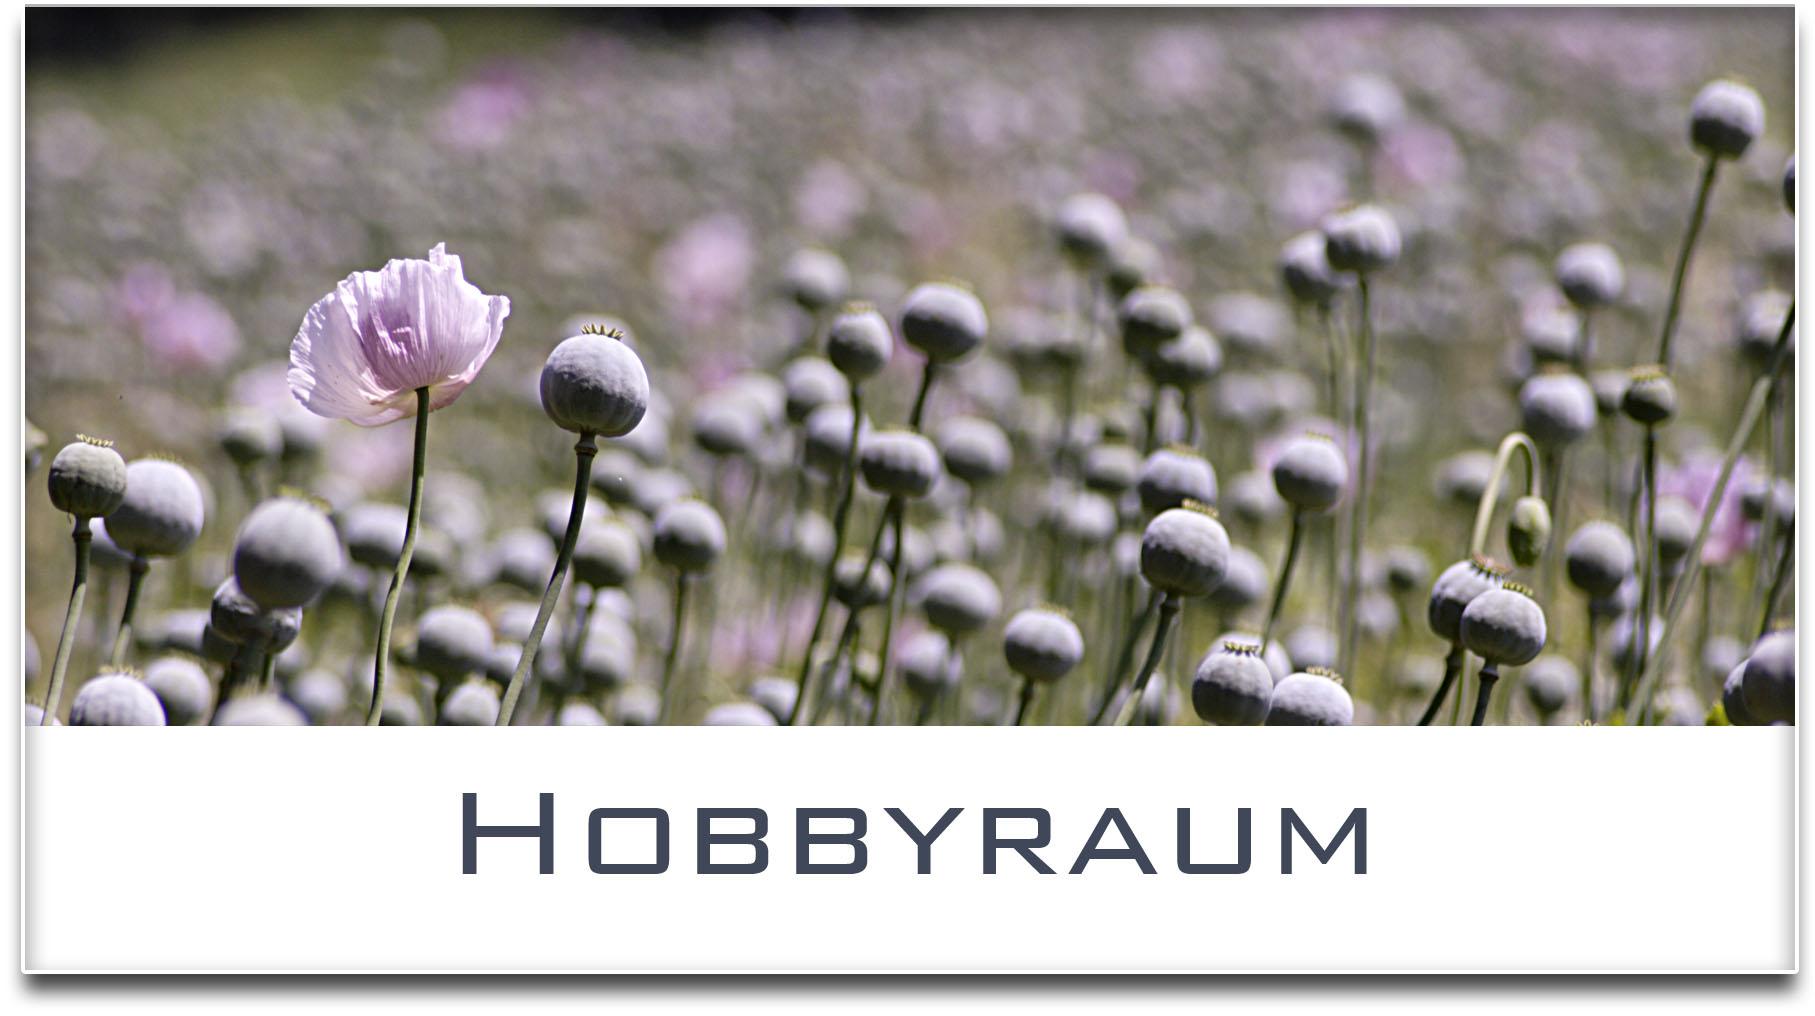 Türschild / Haustürschild / Mohnfeld / Hobbyraum / Selbstklebend